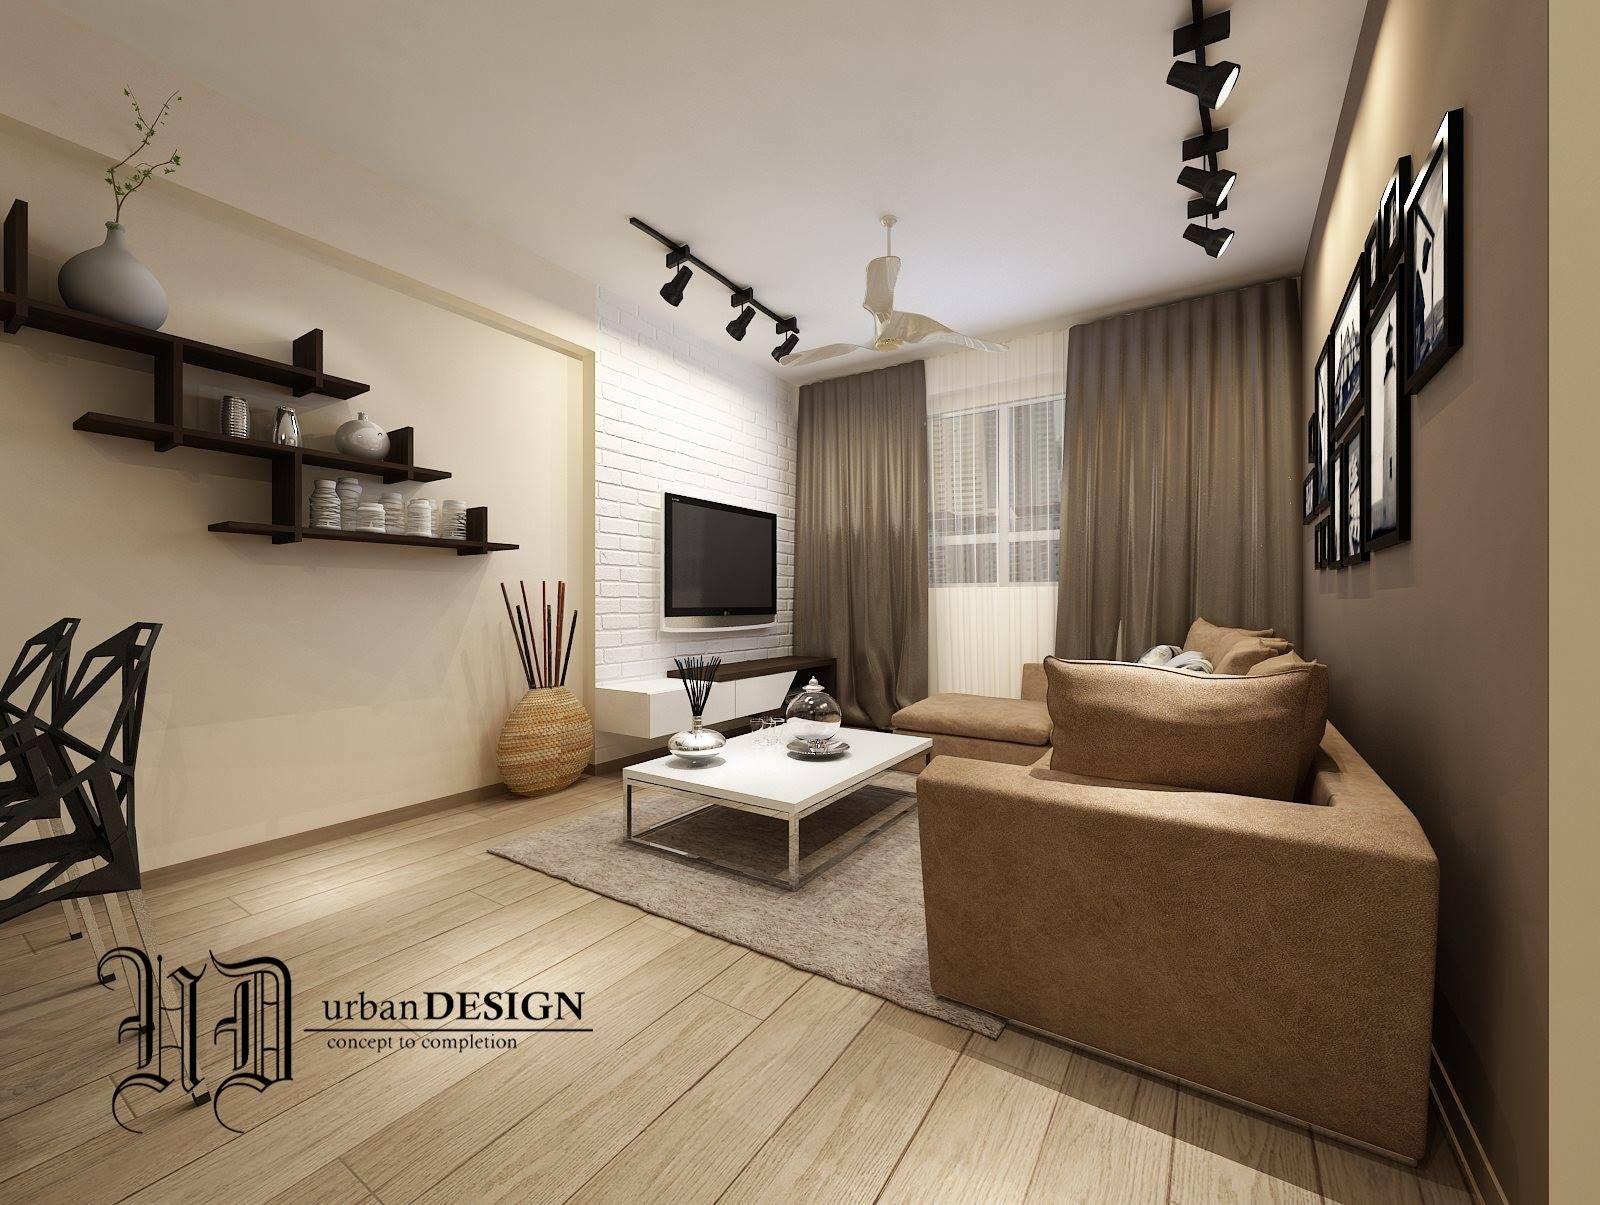 Modern Design By Urbandesignhouse Login To Ift Tt 1oqegtl And